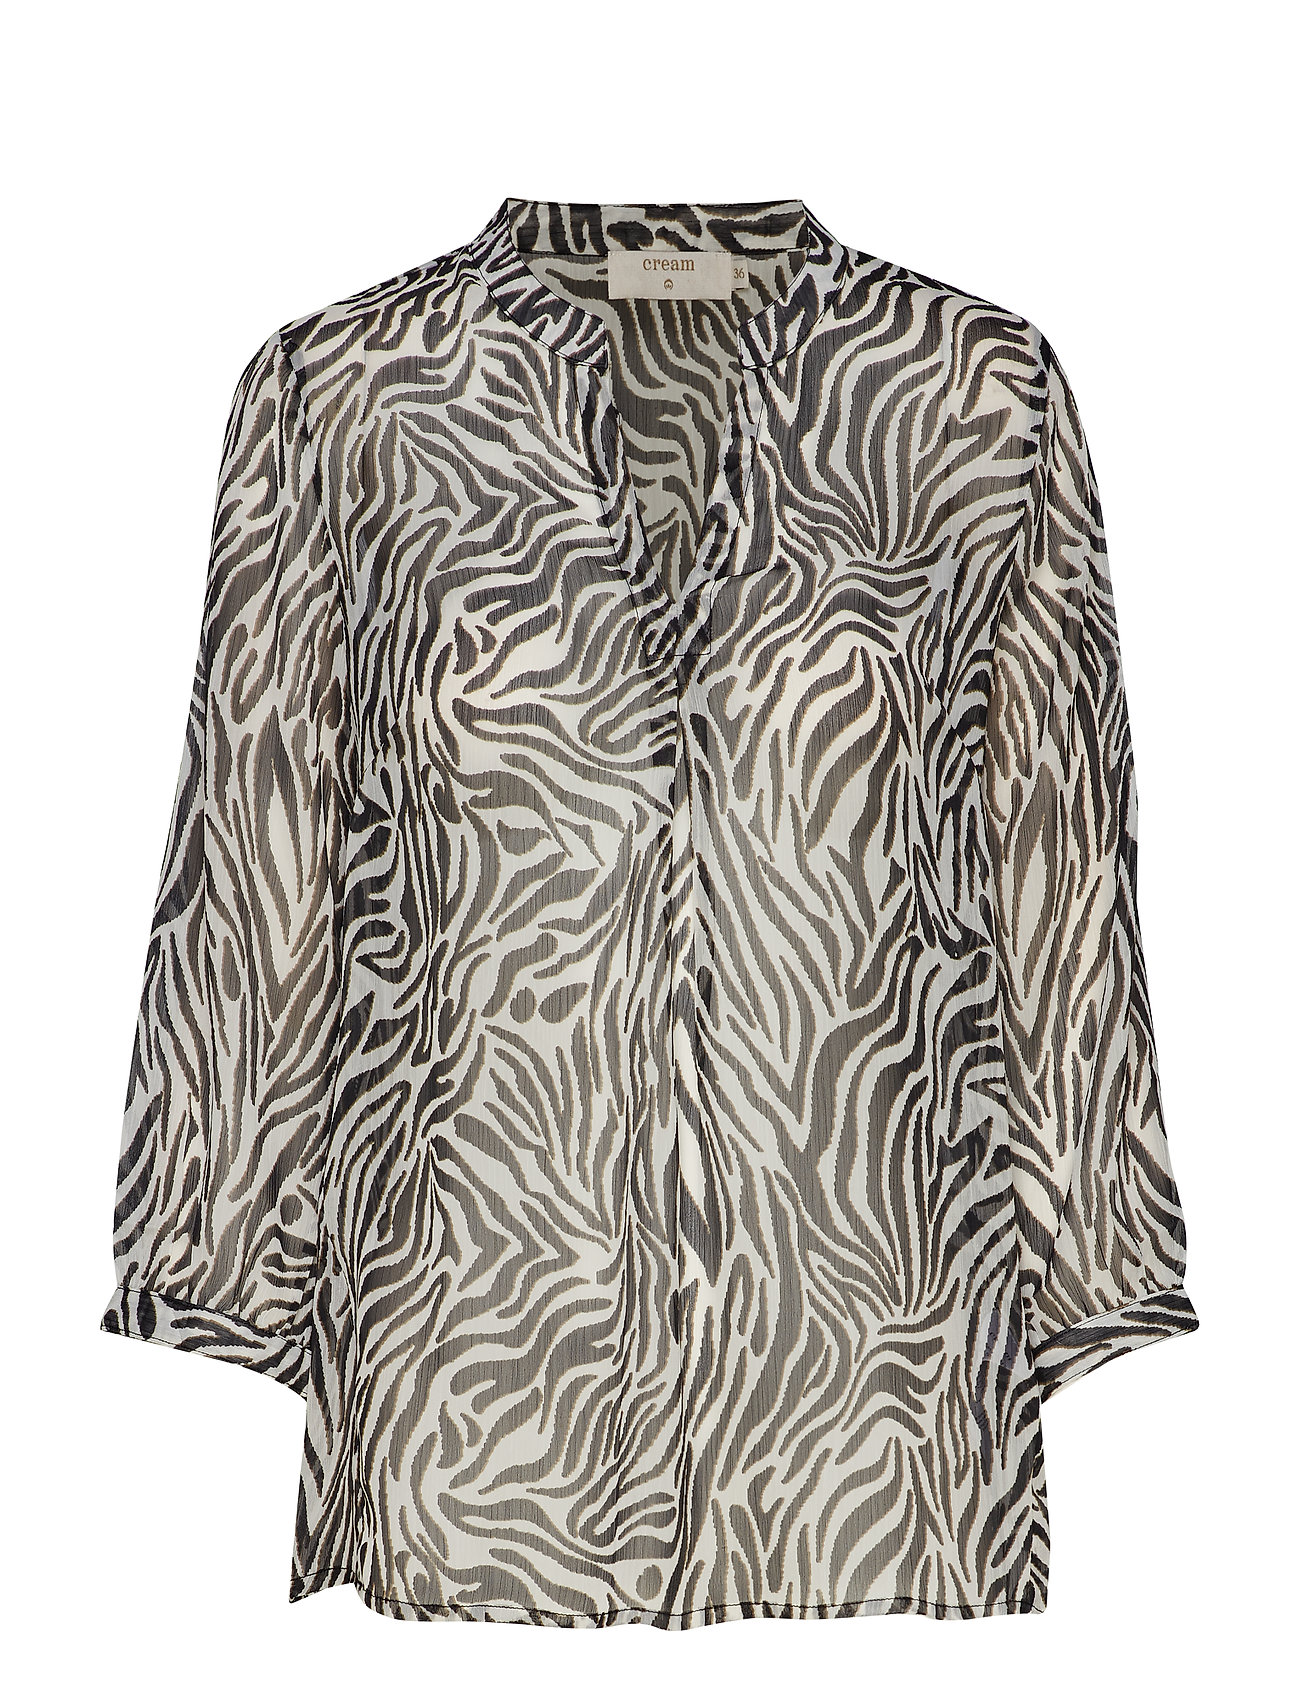 Cream Sama Shirt l/s - PITCH BLACK / ZEBRA PRINT